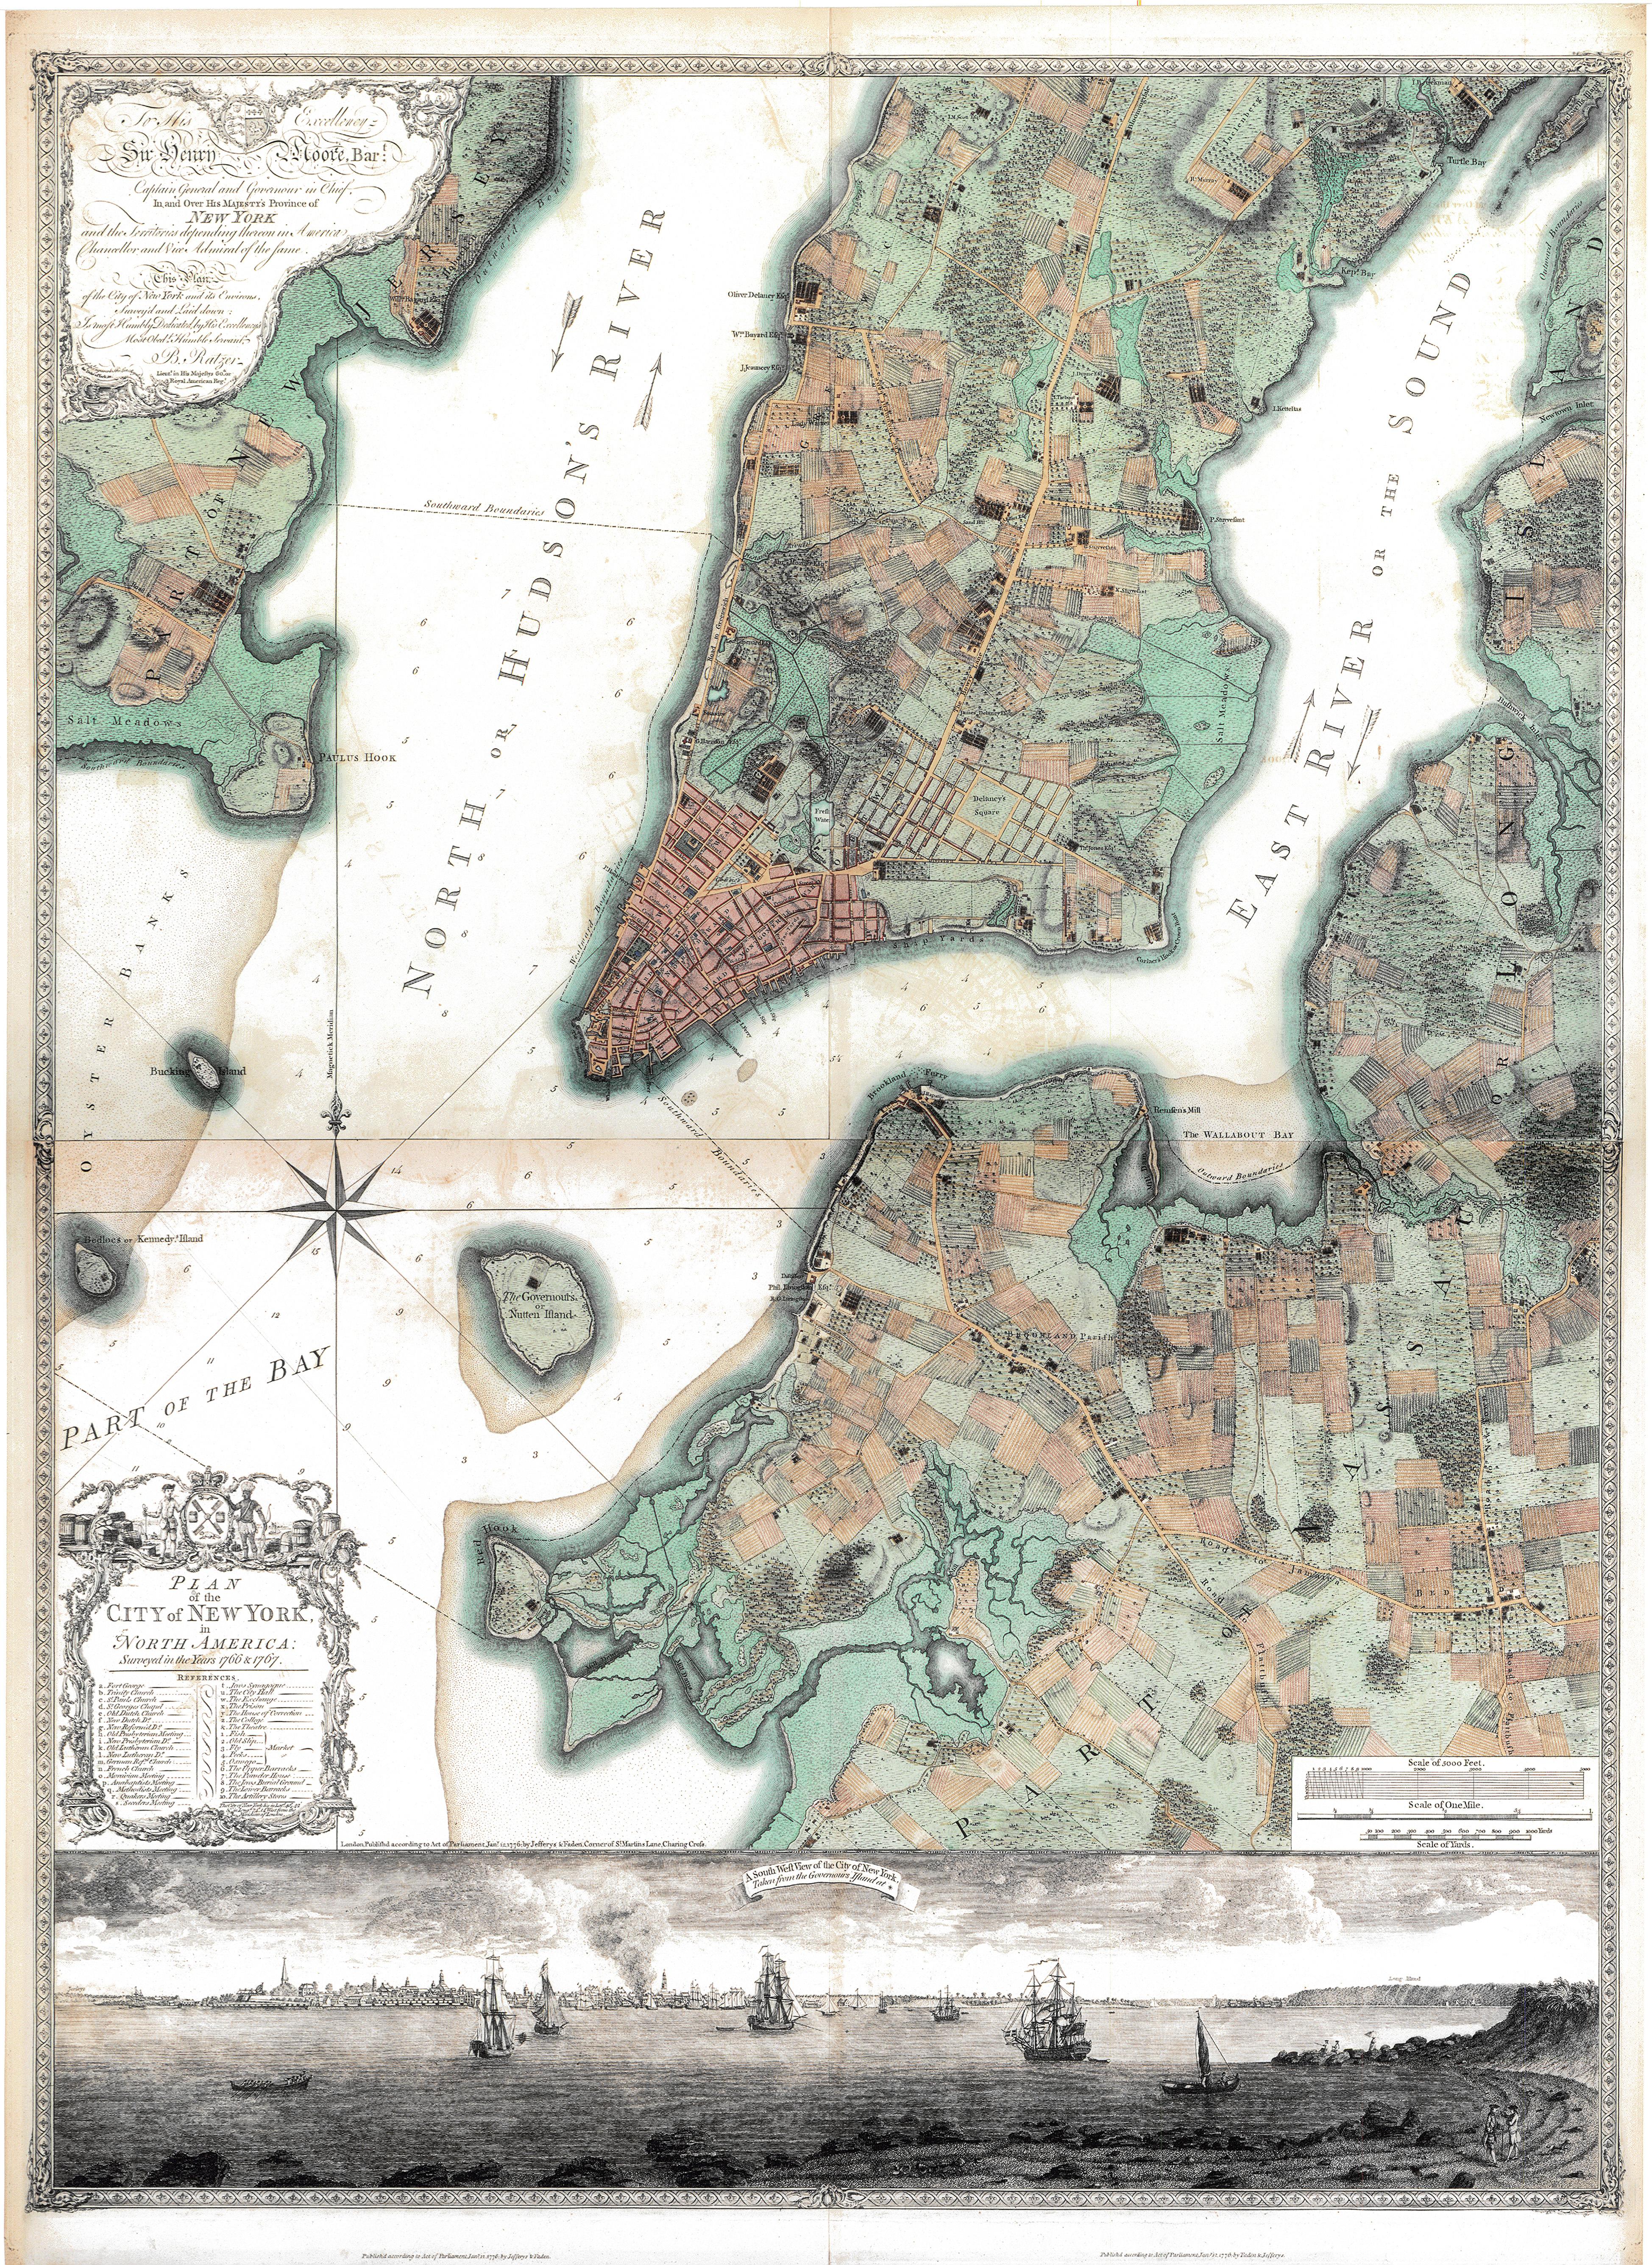 image via wikimedia commons user digbydalton new york city